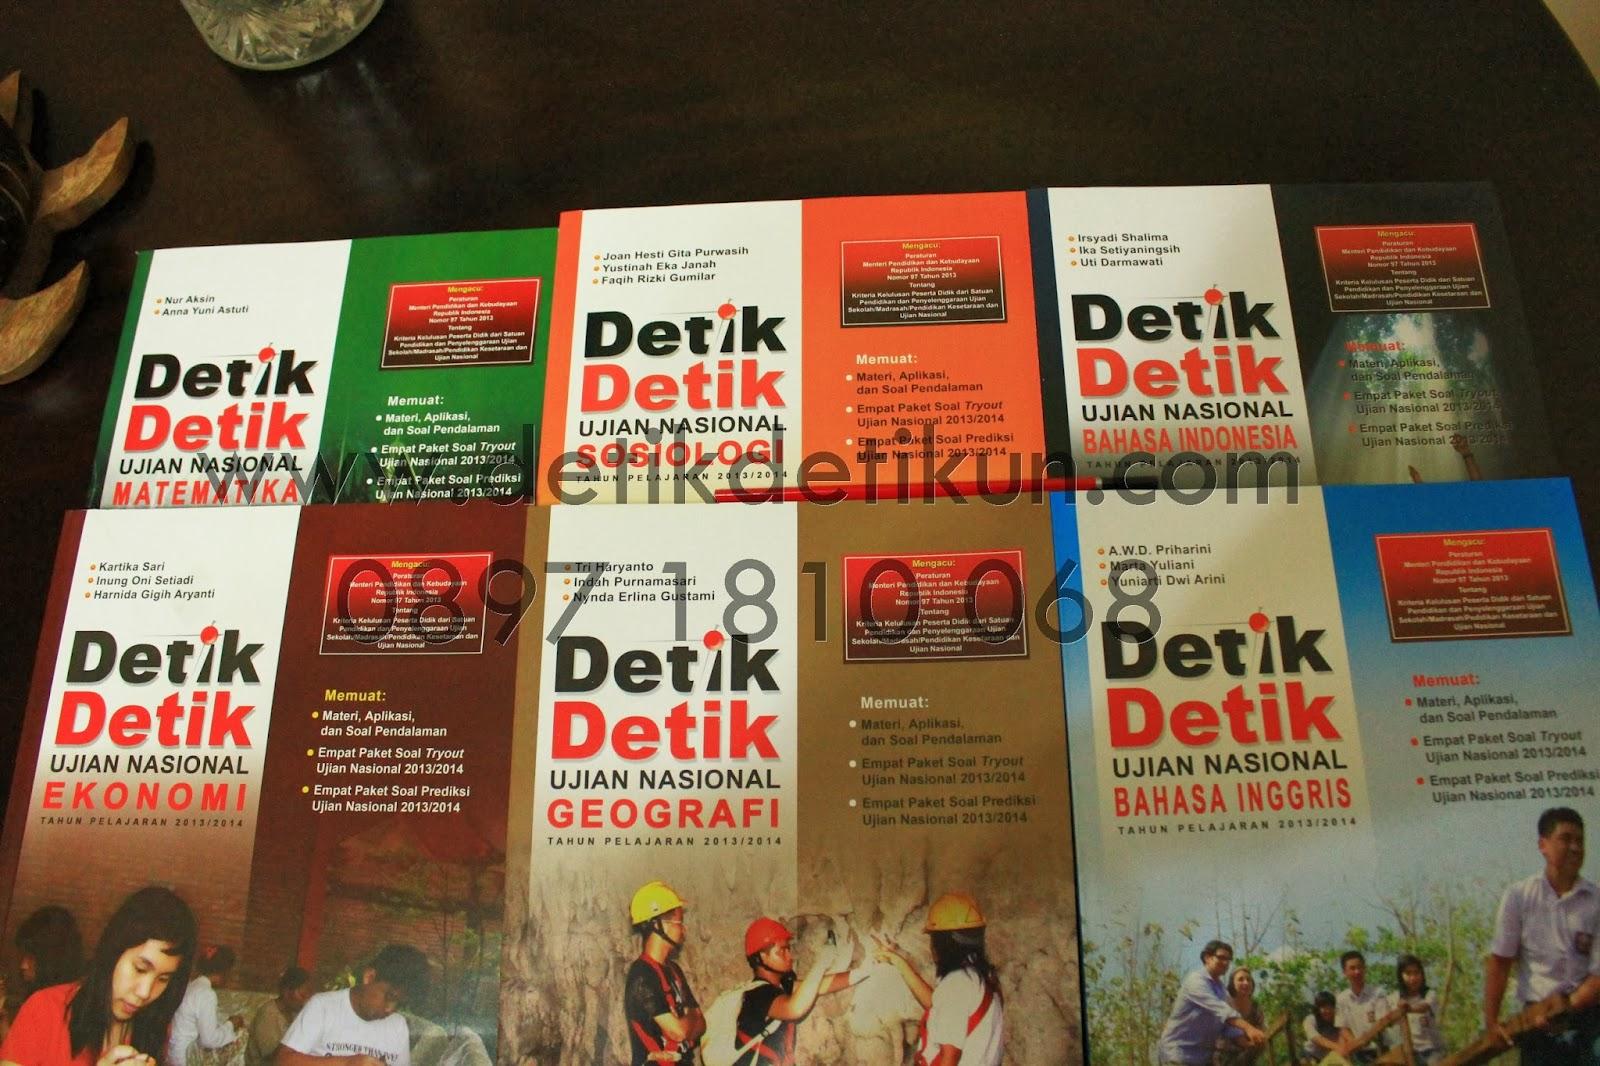 Download Kunci Jawaban Detik Detik Matematika 2014 Kunci Jawaban Buku Detik Detik Un Sd